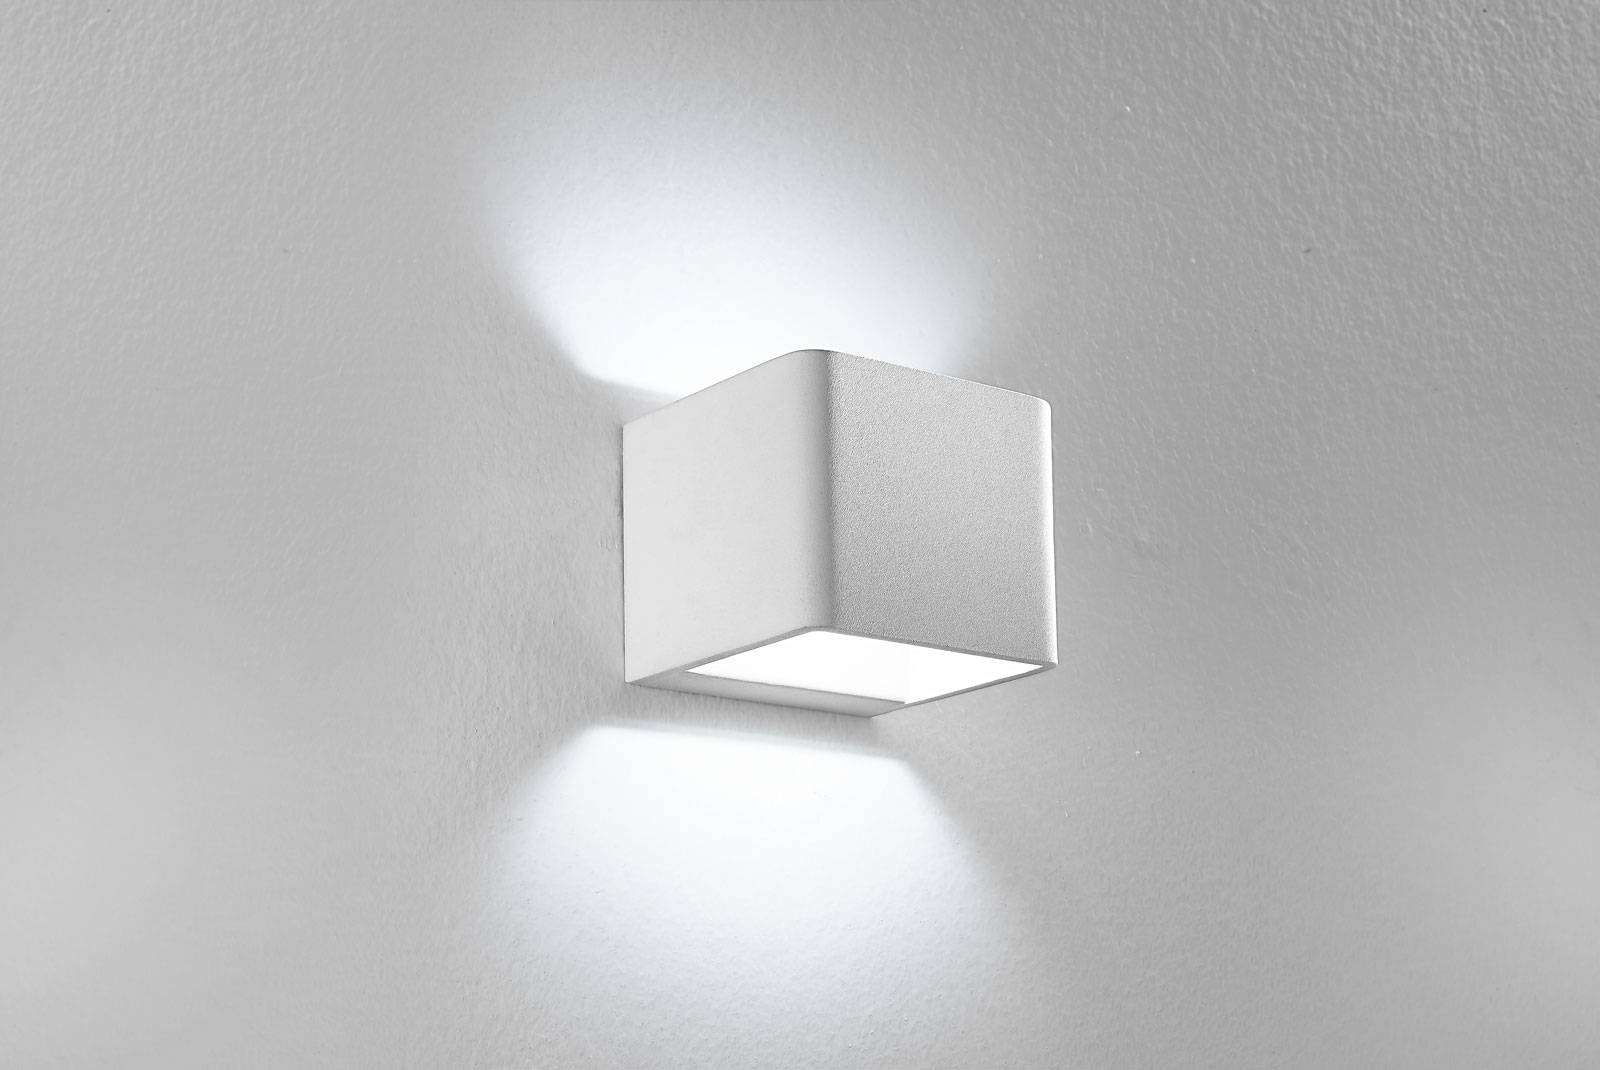 Applique lampade da parete led luce luci roma tuscolana